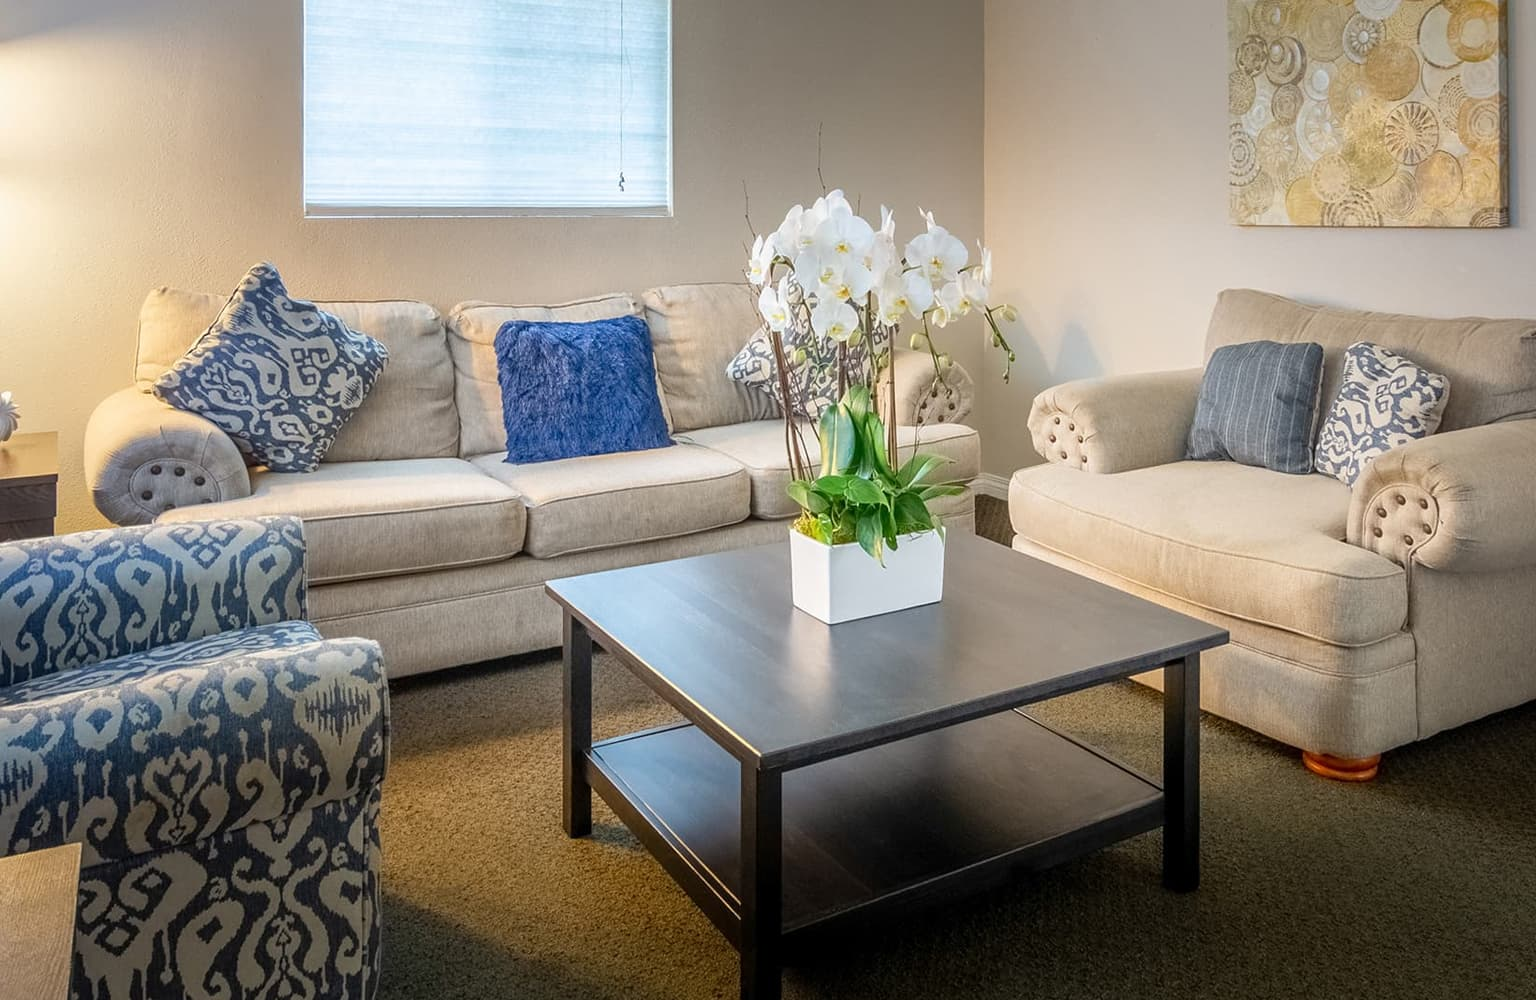 Passages Malibu Sober Living Homes